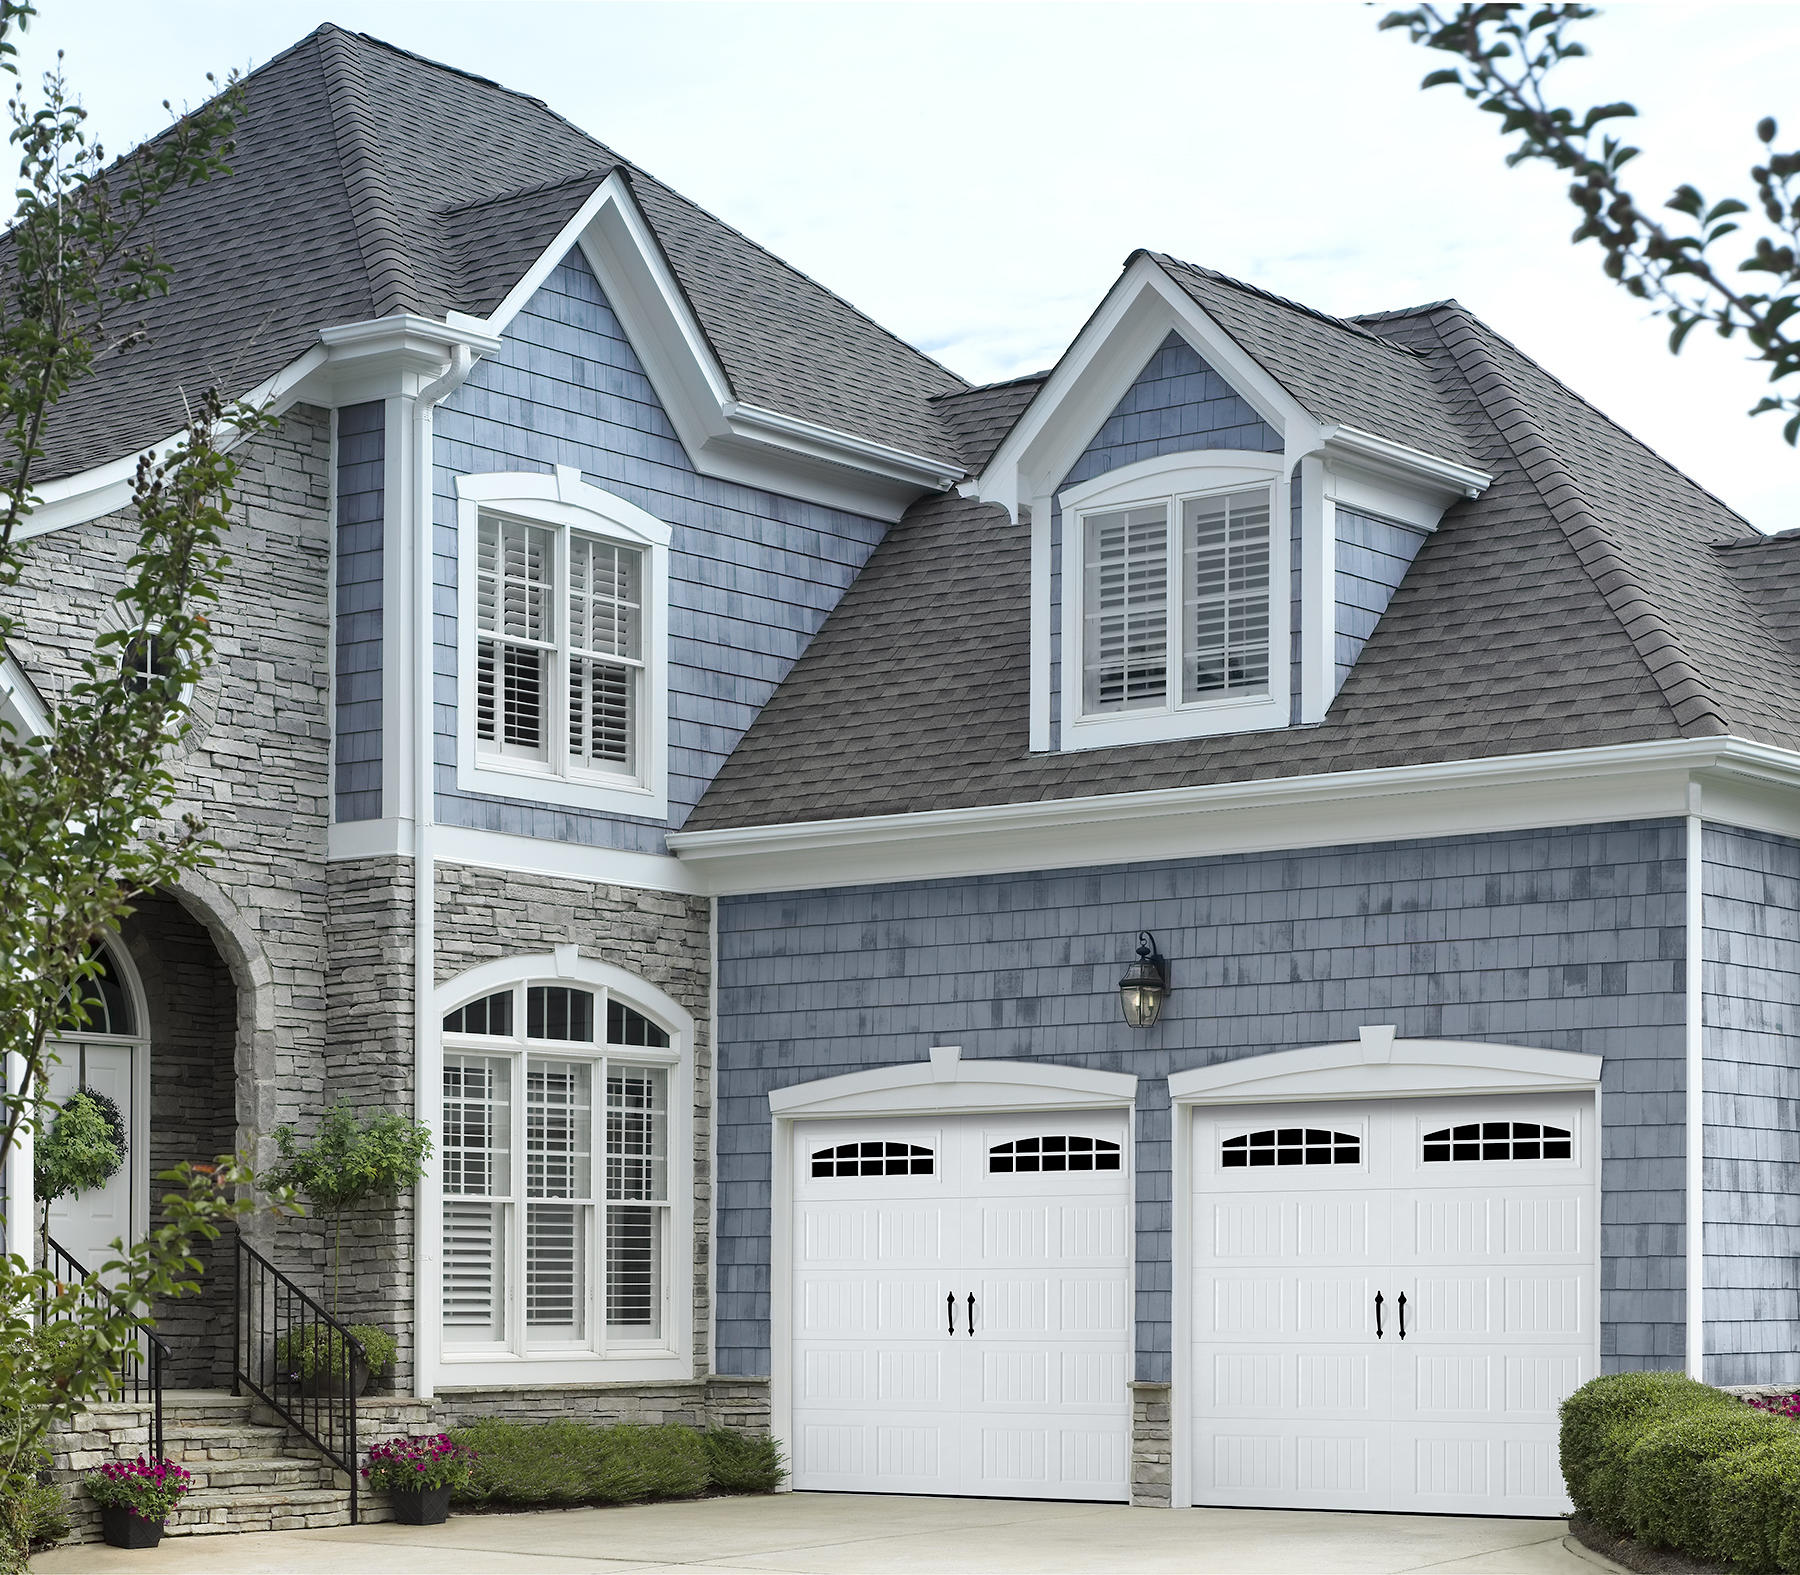 Shop garage door 4300 sharon rd charlotte nc for Garage doors charlotte nc